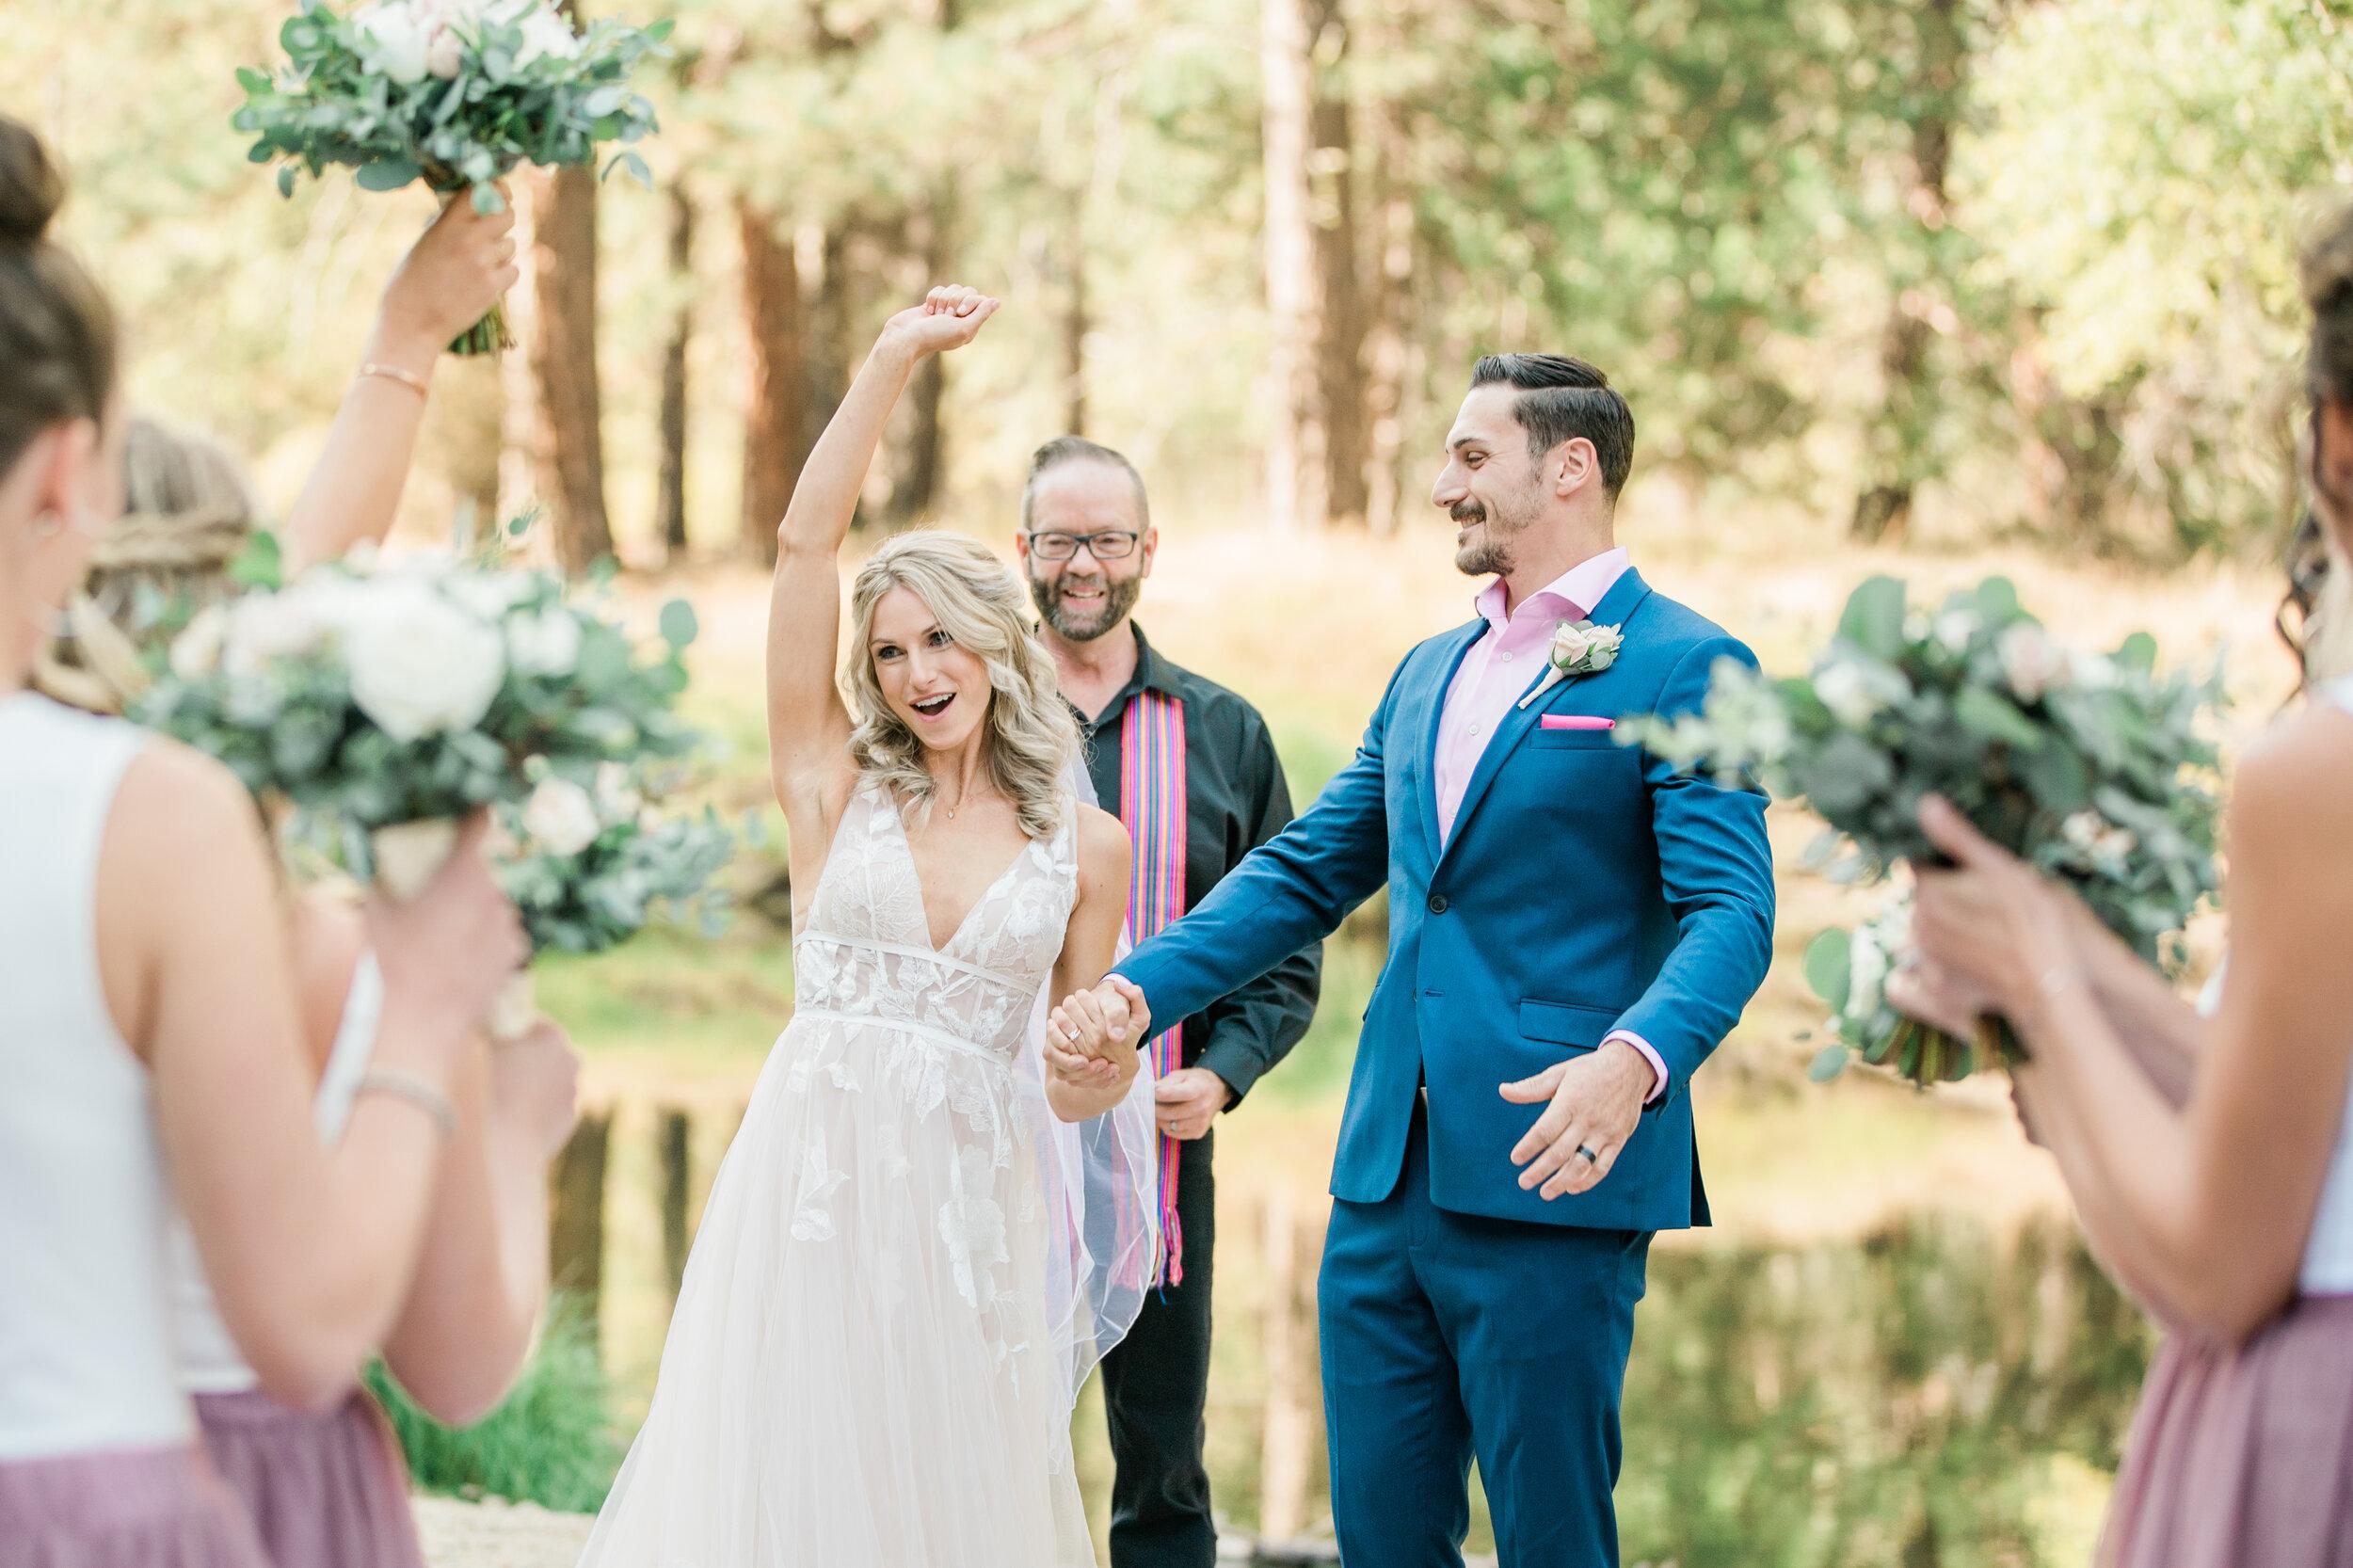 Leanne and Joe - Married - Sneak Peeks - Lauren Alisse Photography-20.jpg